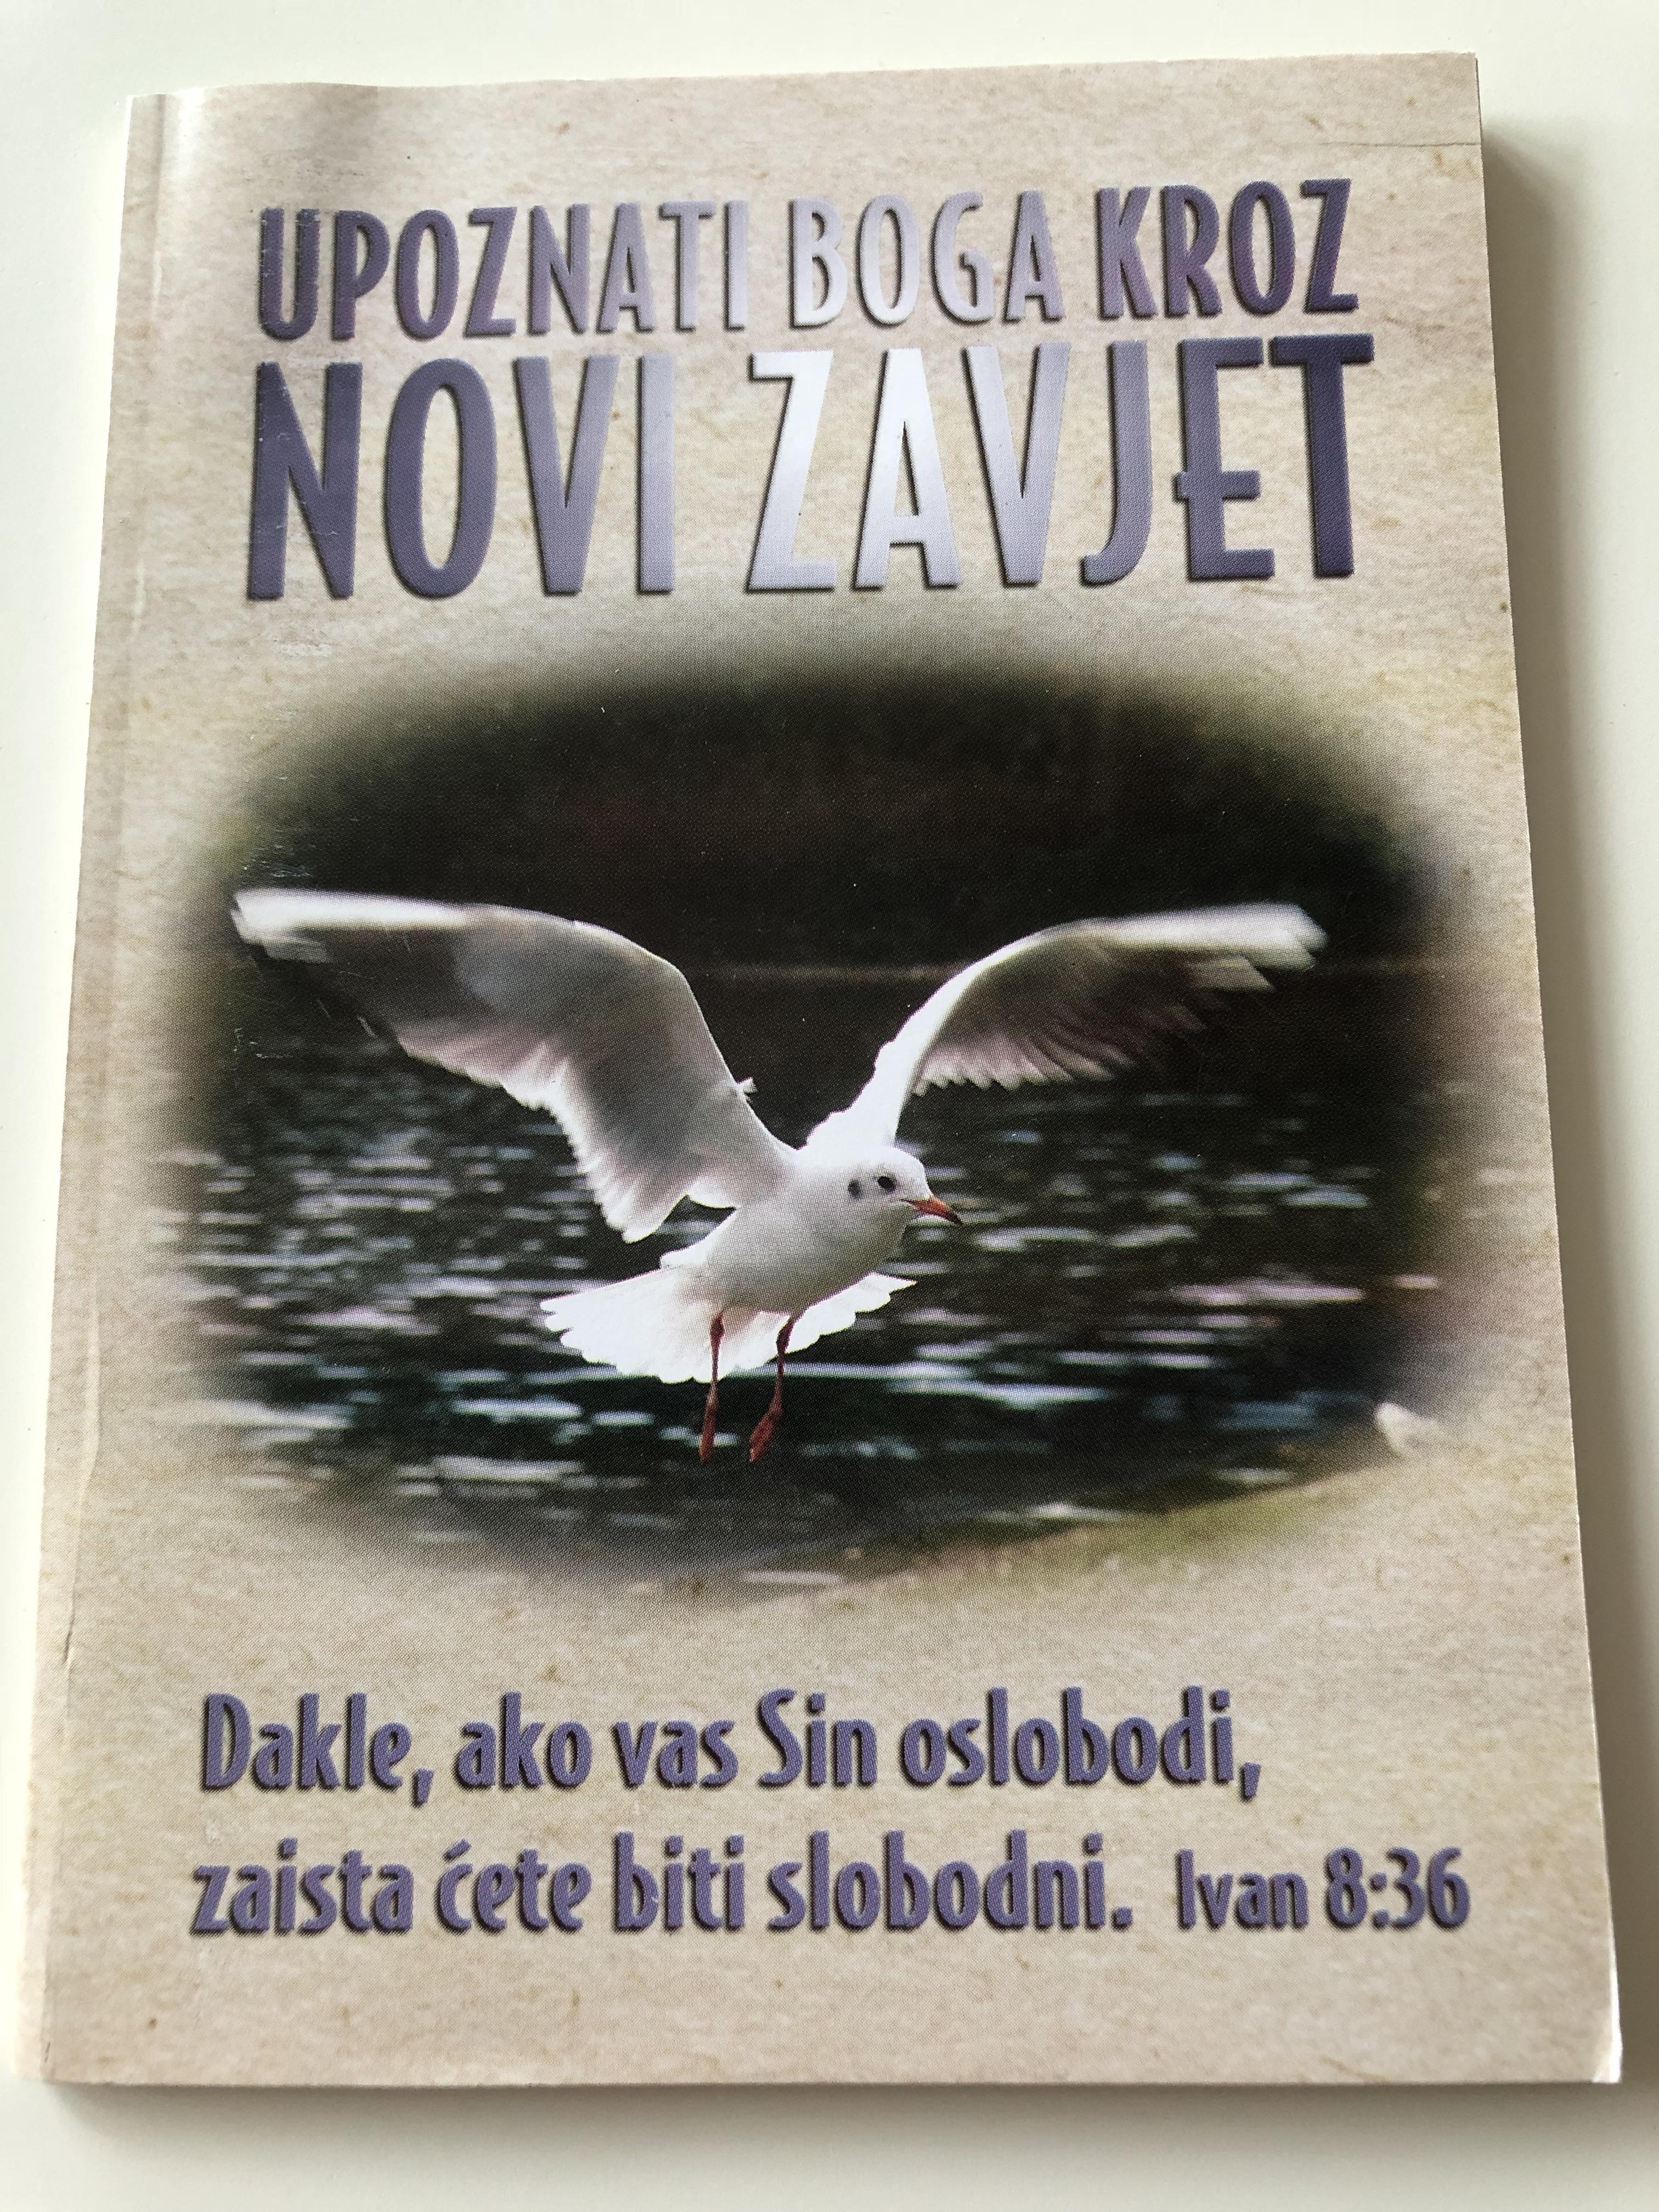 upoznati-boga-kroz-novi-zavjet-croatian-language-booklet-knowing-god-through-the-new-testament-david-egner-paperback-2004-1-.jpg